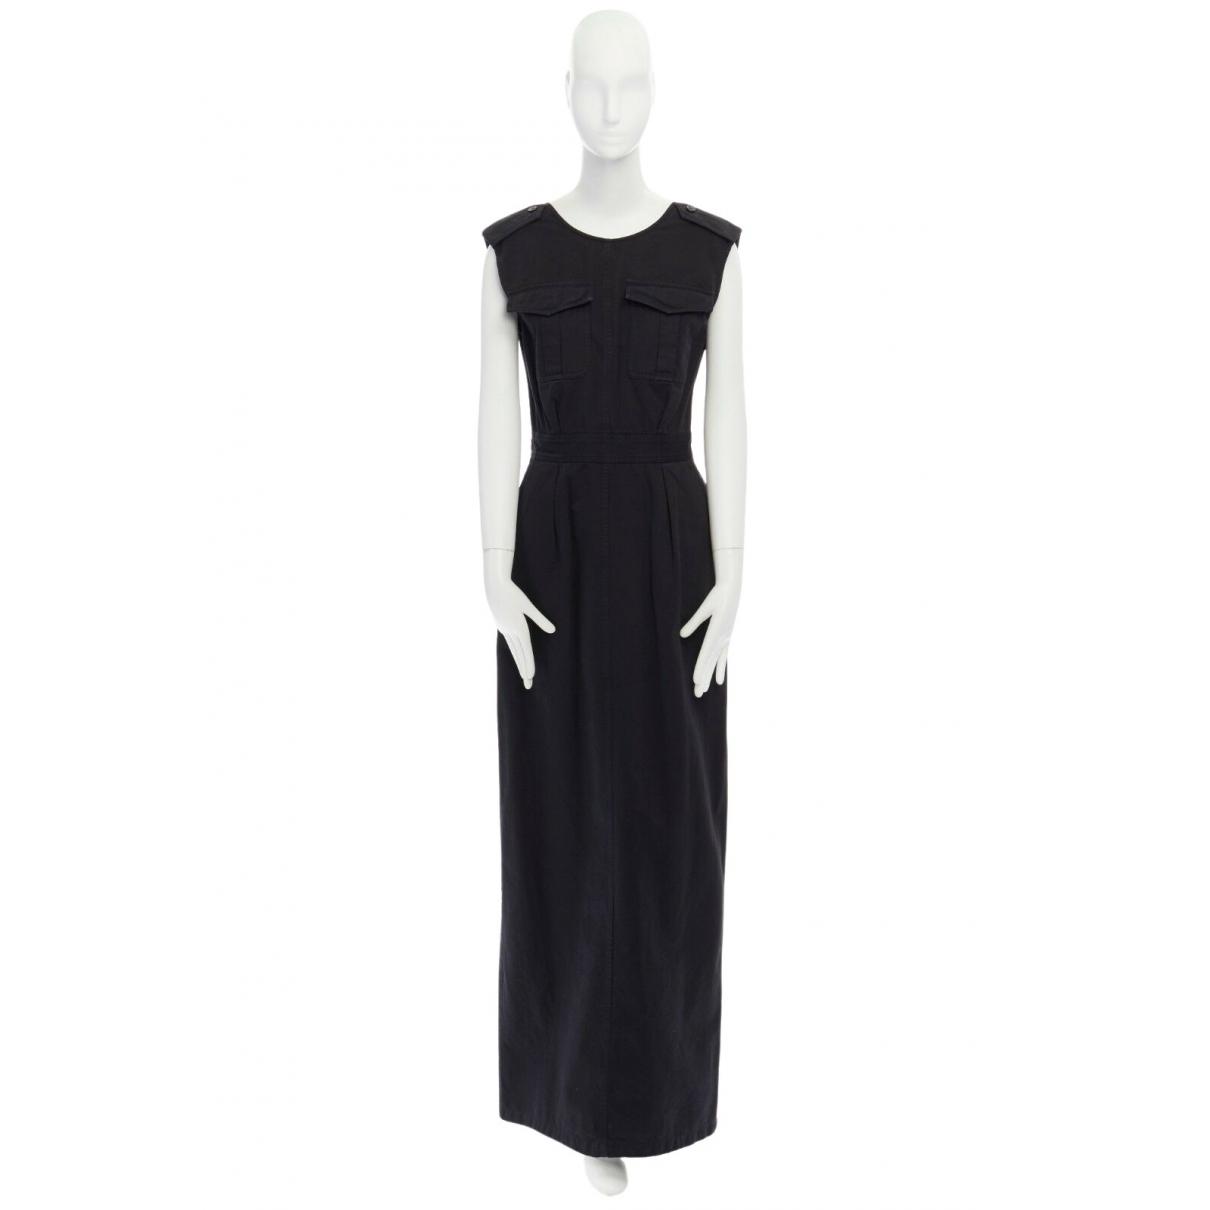 Dries Van Noten \N Kleid in  Schwarz Baumwolle